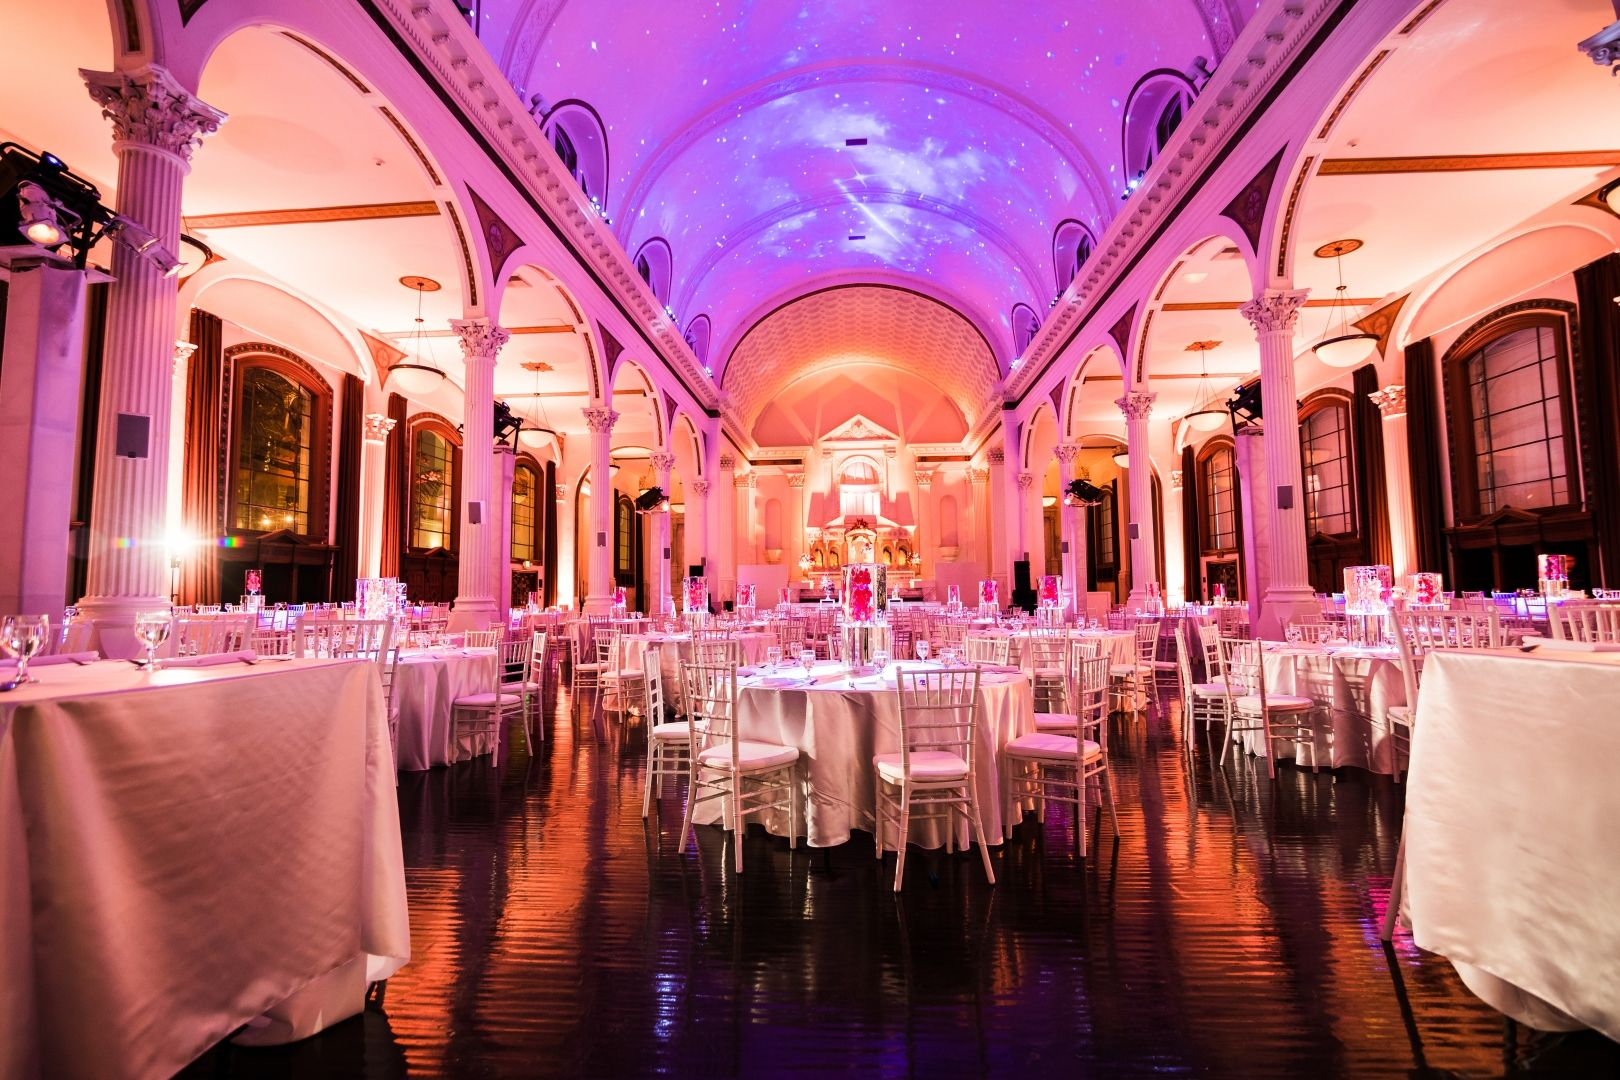 Weddings and Social Events - Vibiana | Reception Décor | Pinterest ...